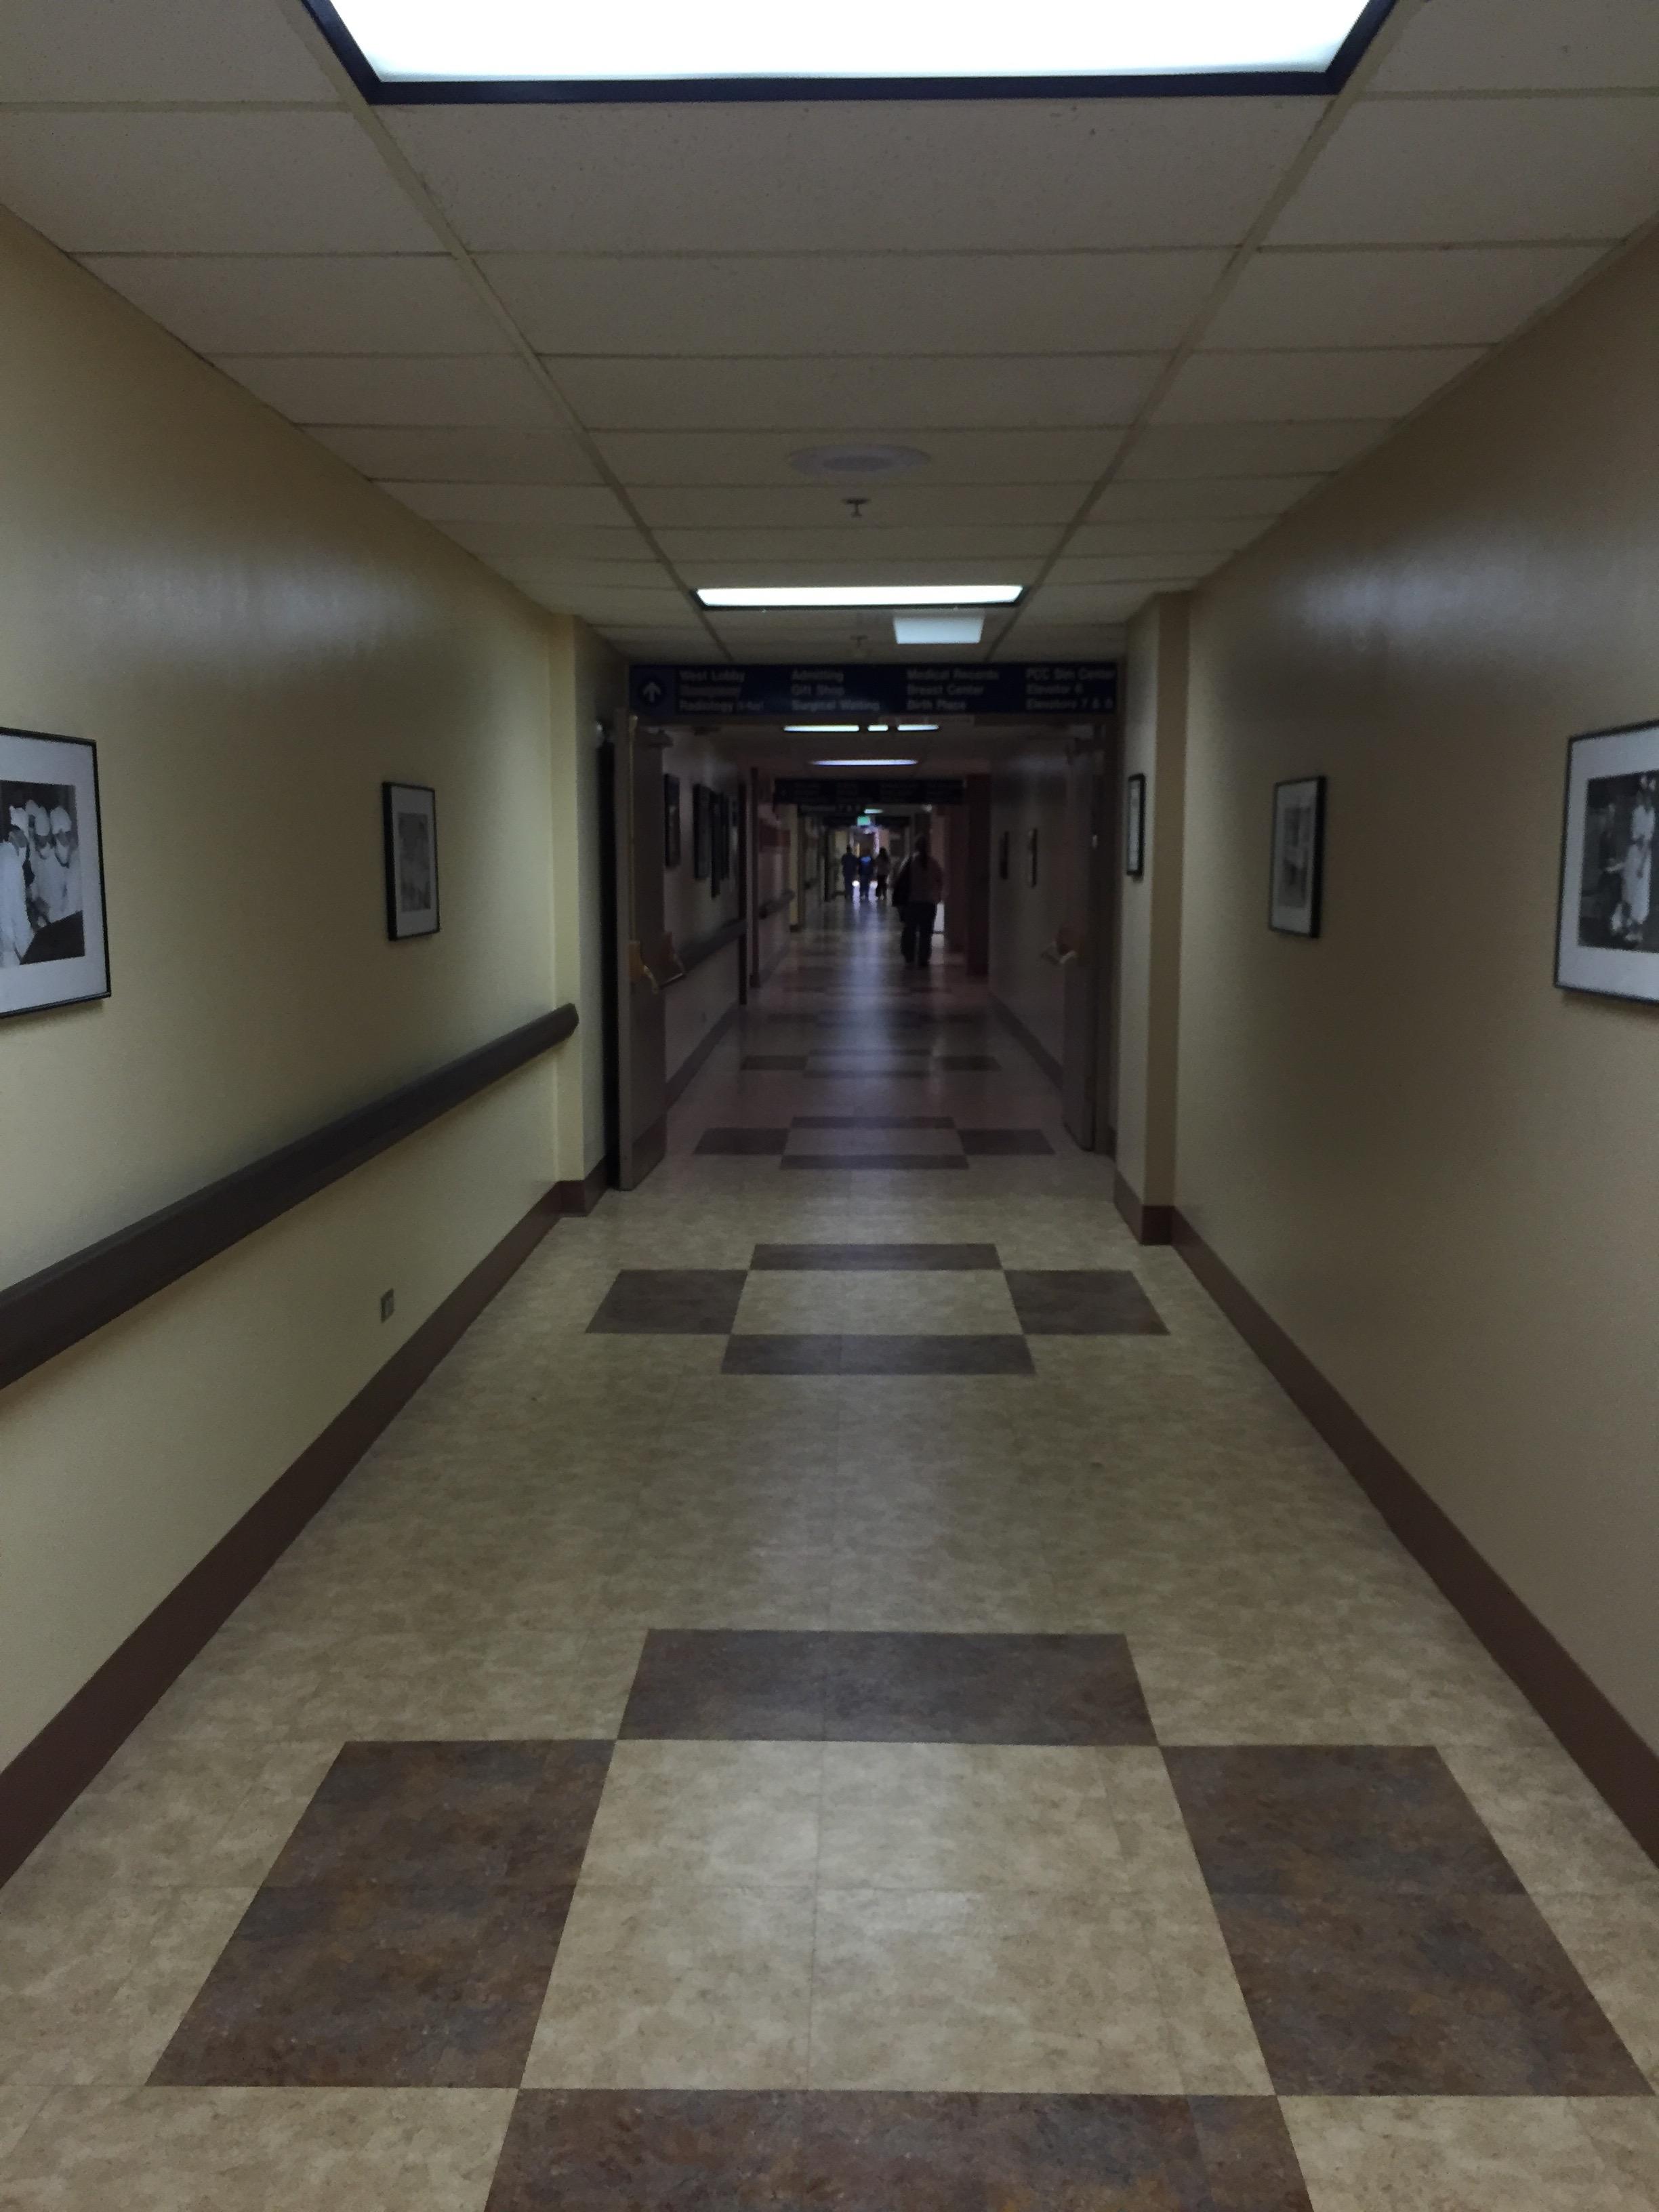 Saint Mary-Corwin Medical Center